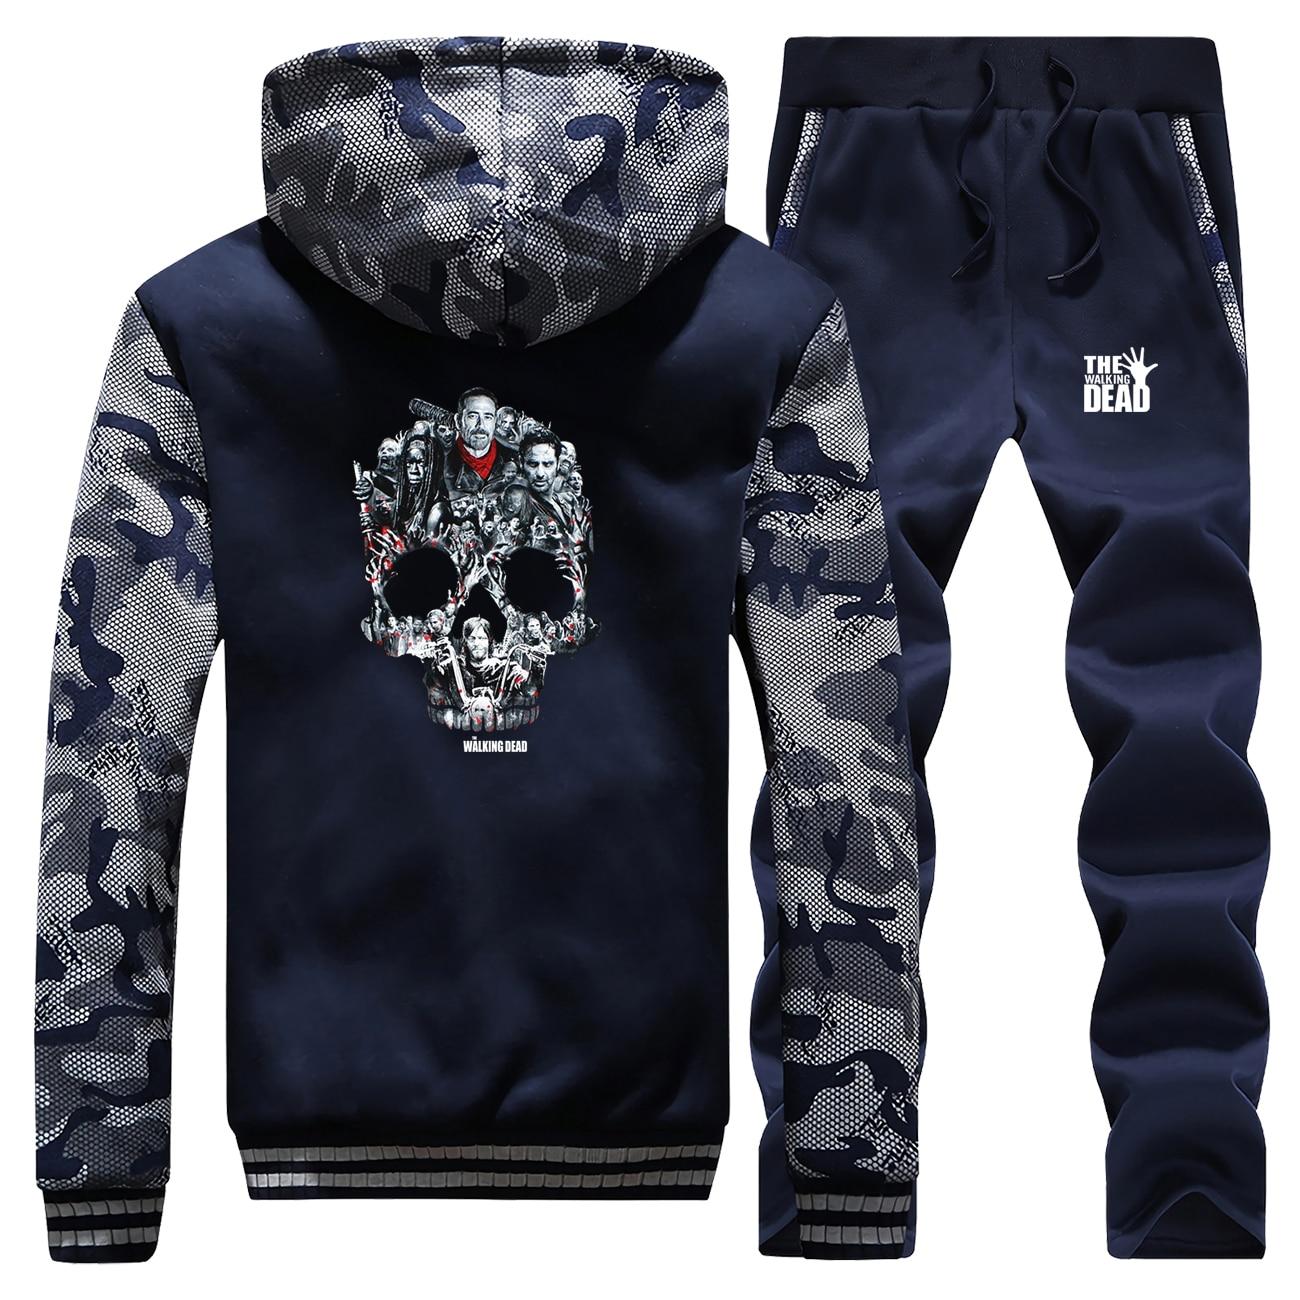 The Walking Dead TV Show Camo Sleeve Jacket Negan Fashion Male Set Rick Skull Casual Men's Full Suit Tracksuit Winter Streetwear